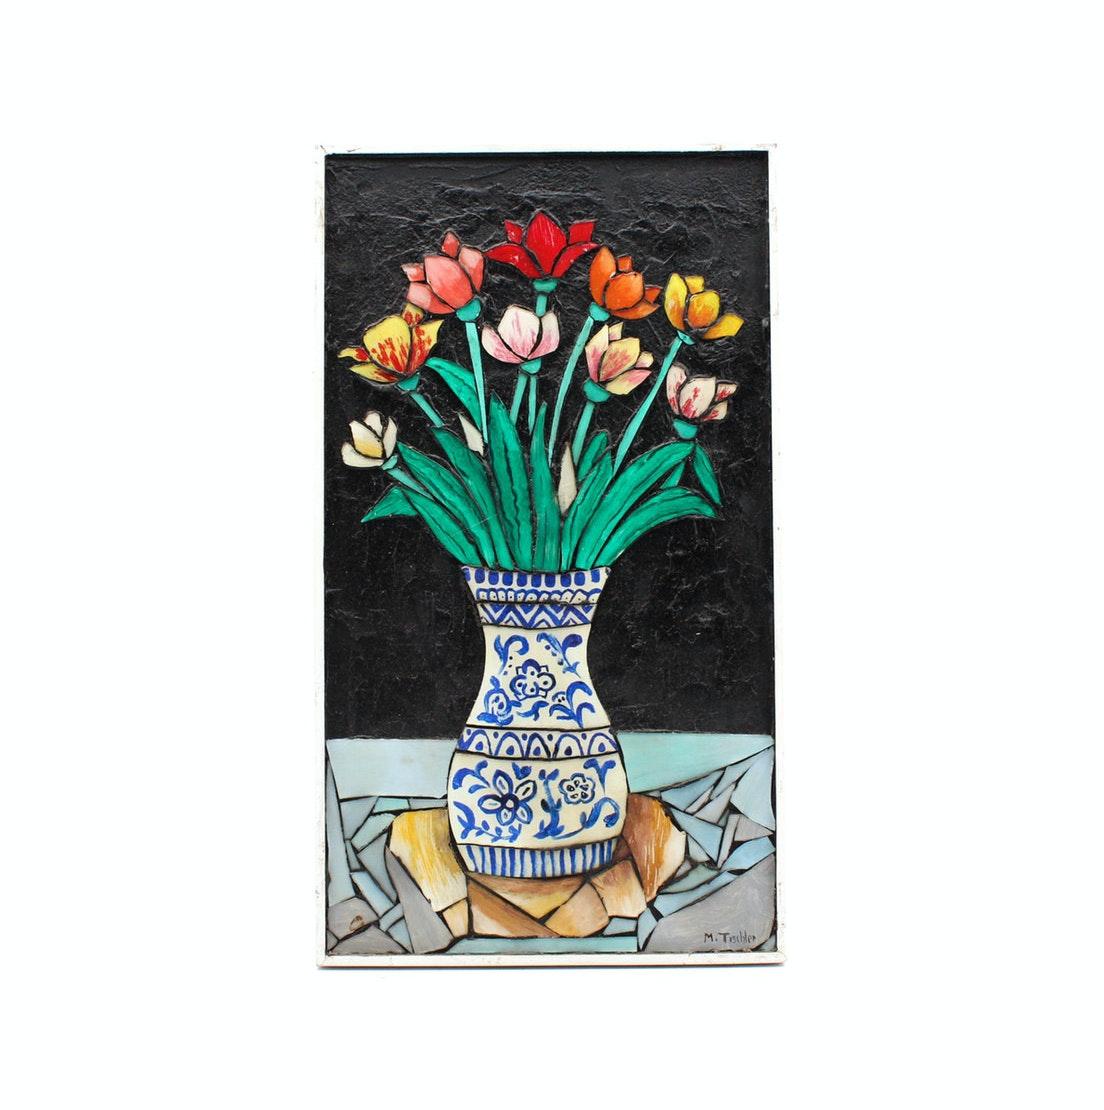 Art, Antiques, Home Furnishings & More